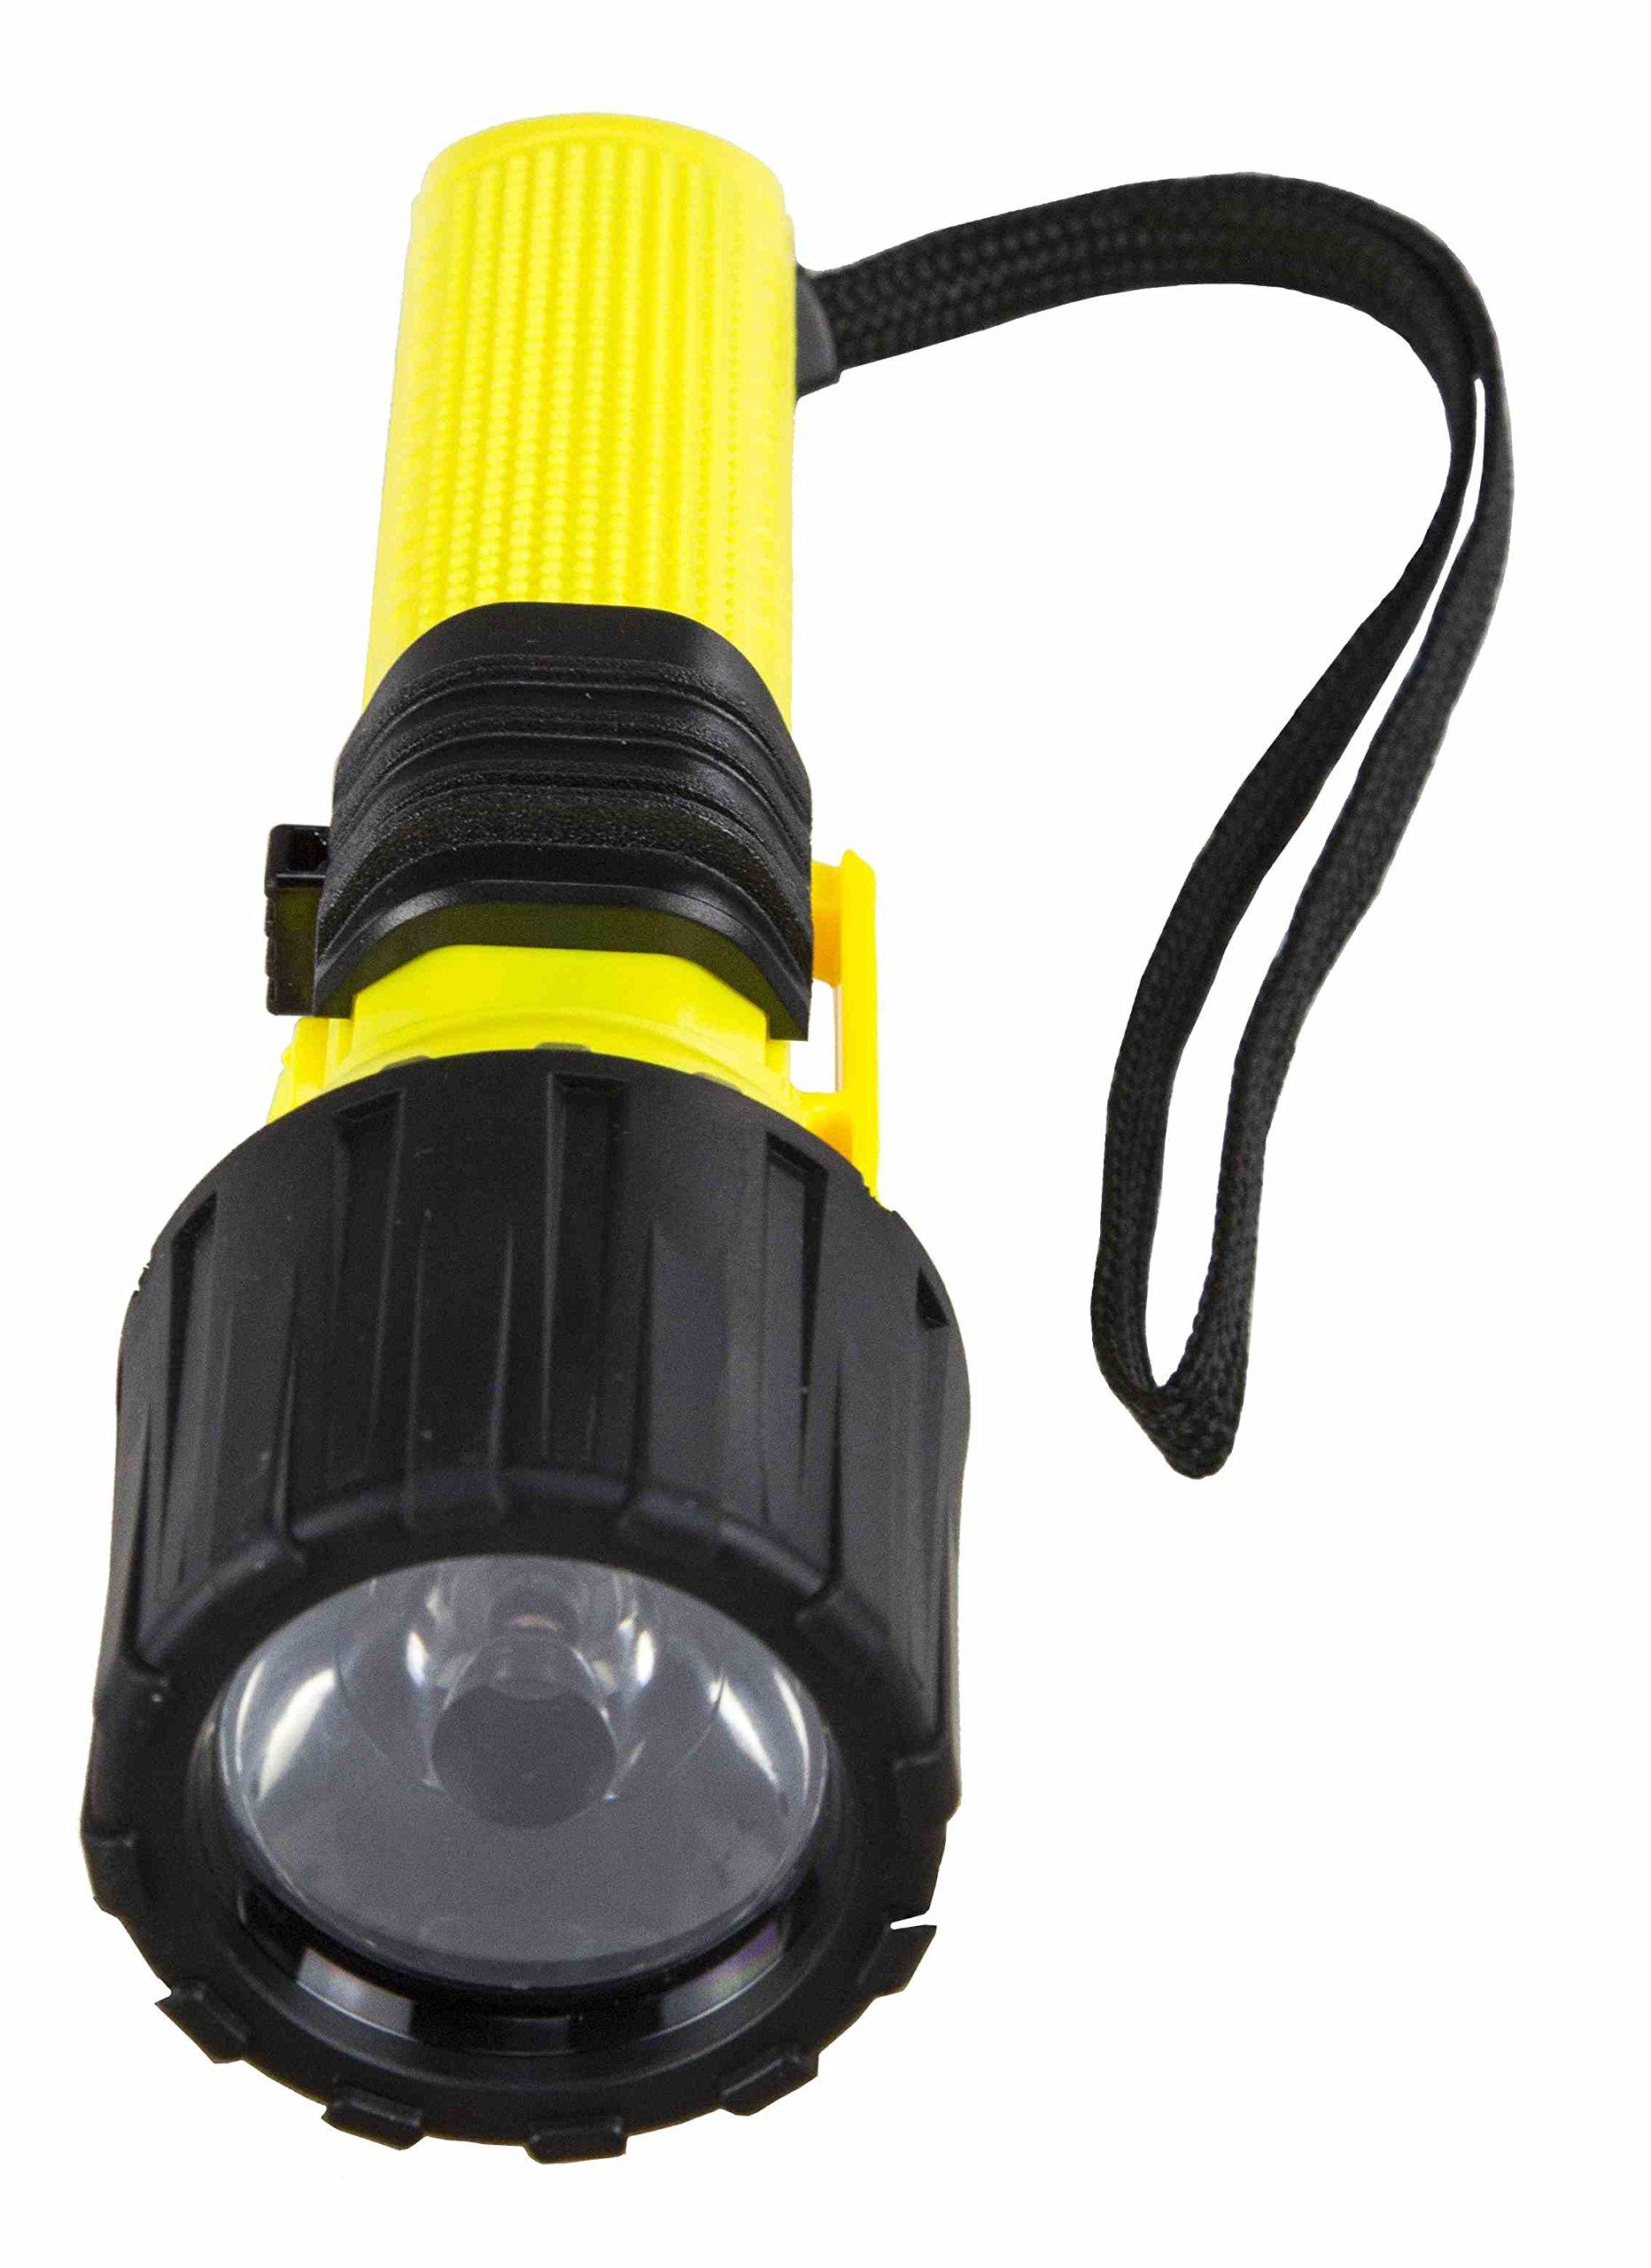 Intrinsically Safe LED Flashlight - C1D1 / C2D1 - 383' Beam - IP68 - Switch Lock - MSHA Rated